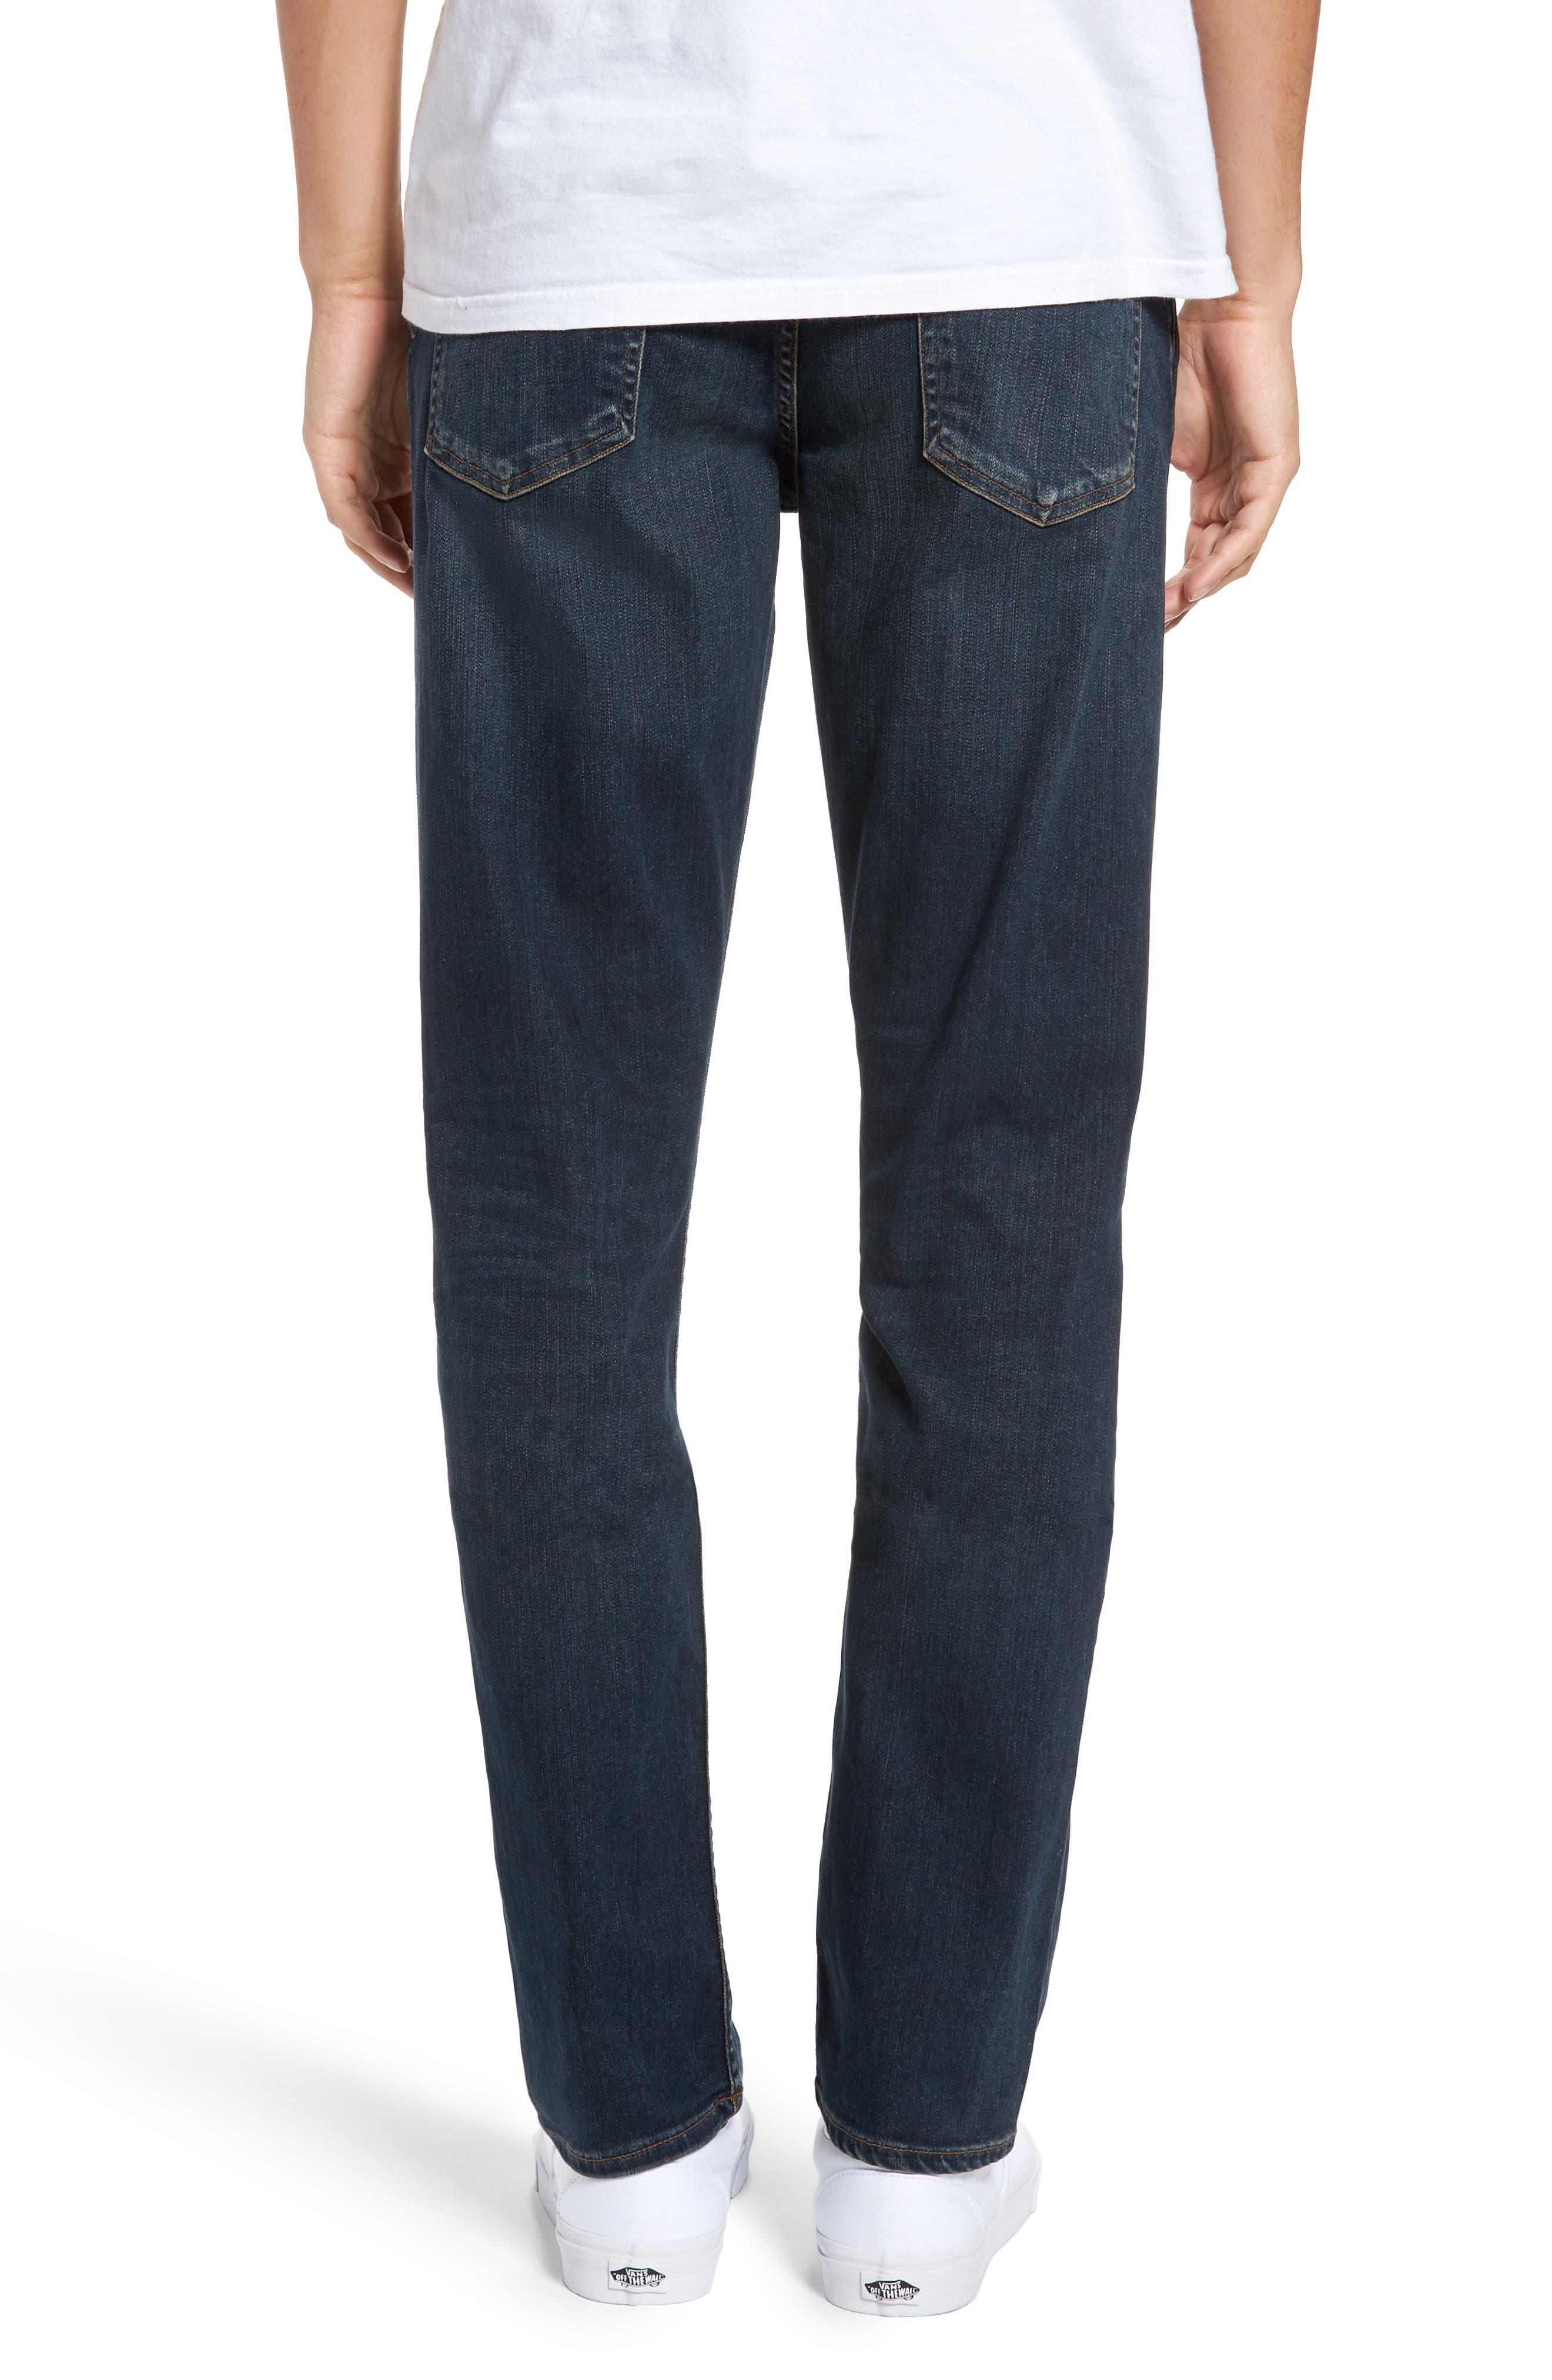 PERFORM - Bowery Slim Fit Jeans,                             Alternate thumbnail 2, color,                             Kingman